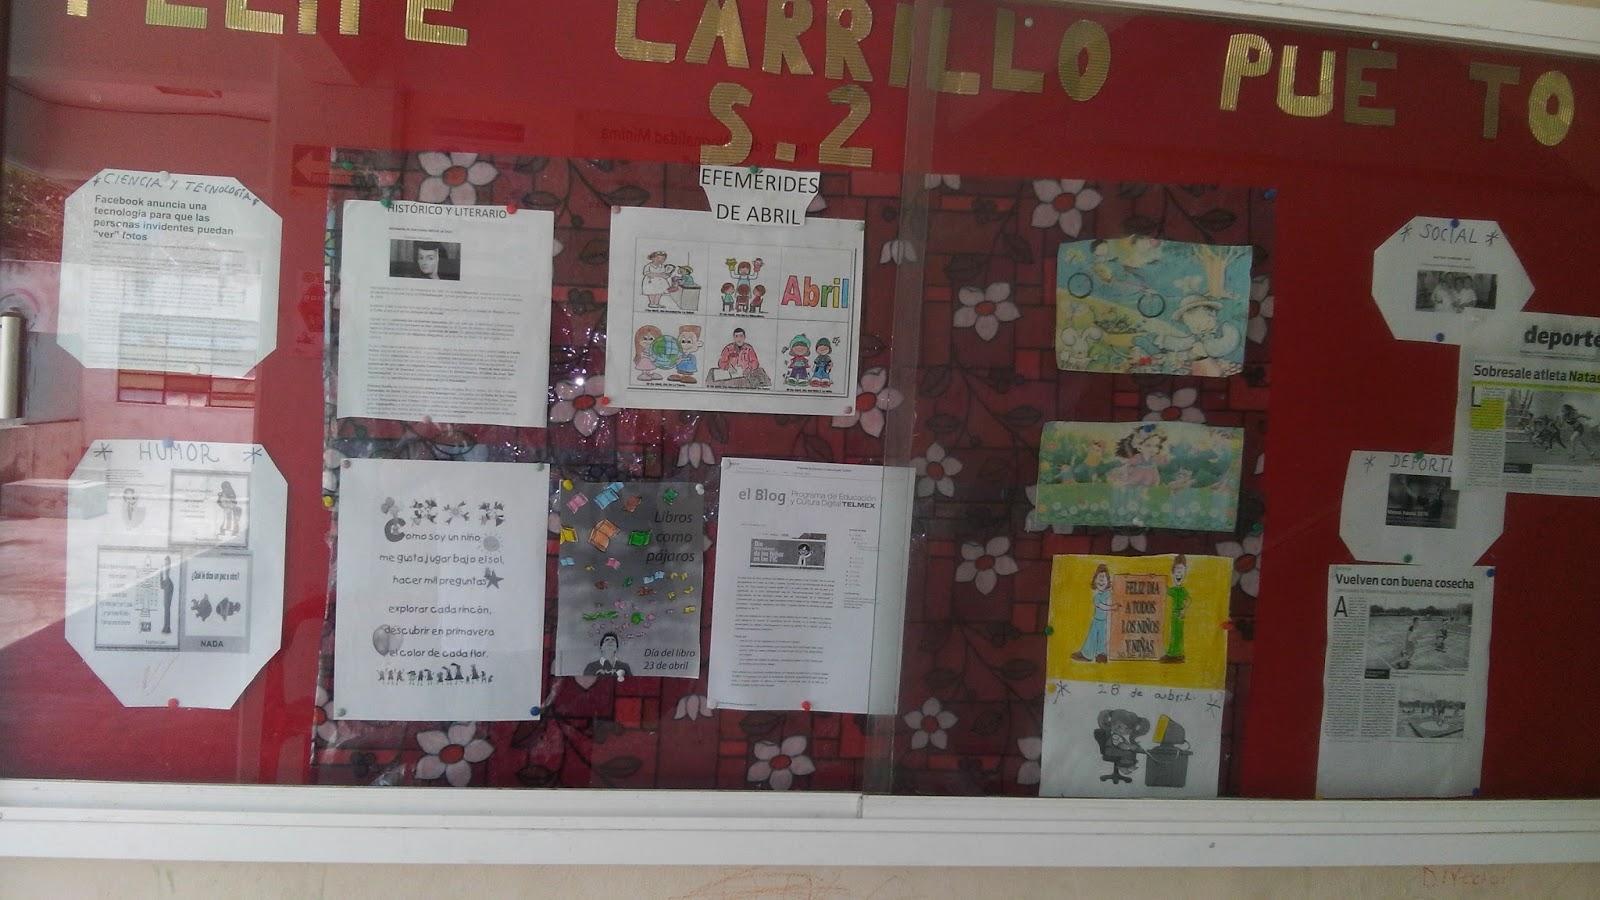 Escuela primaria felipe carrillo puerto seccion 2 abril 2016 for Diario mural fiestas patrias chile